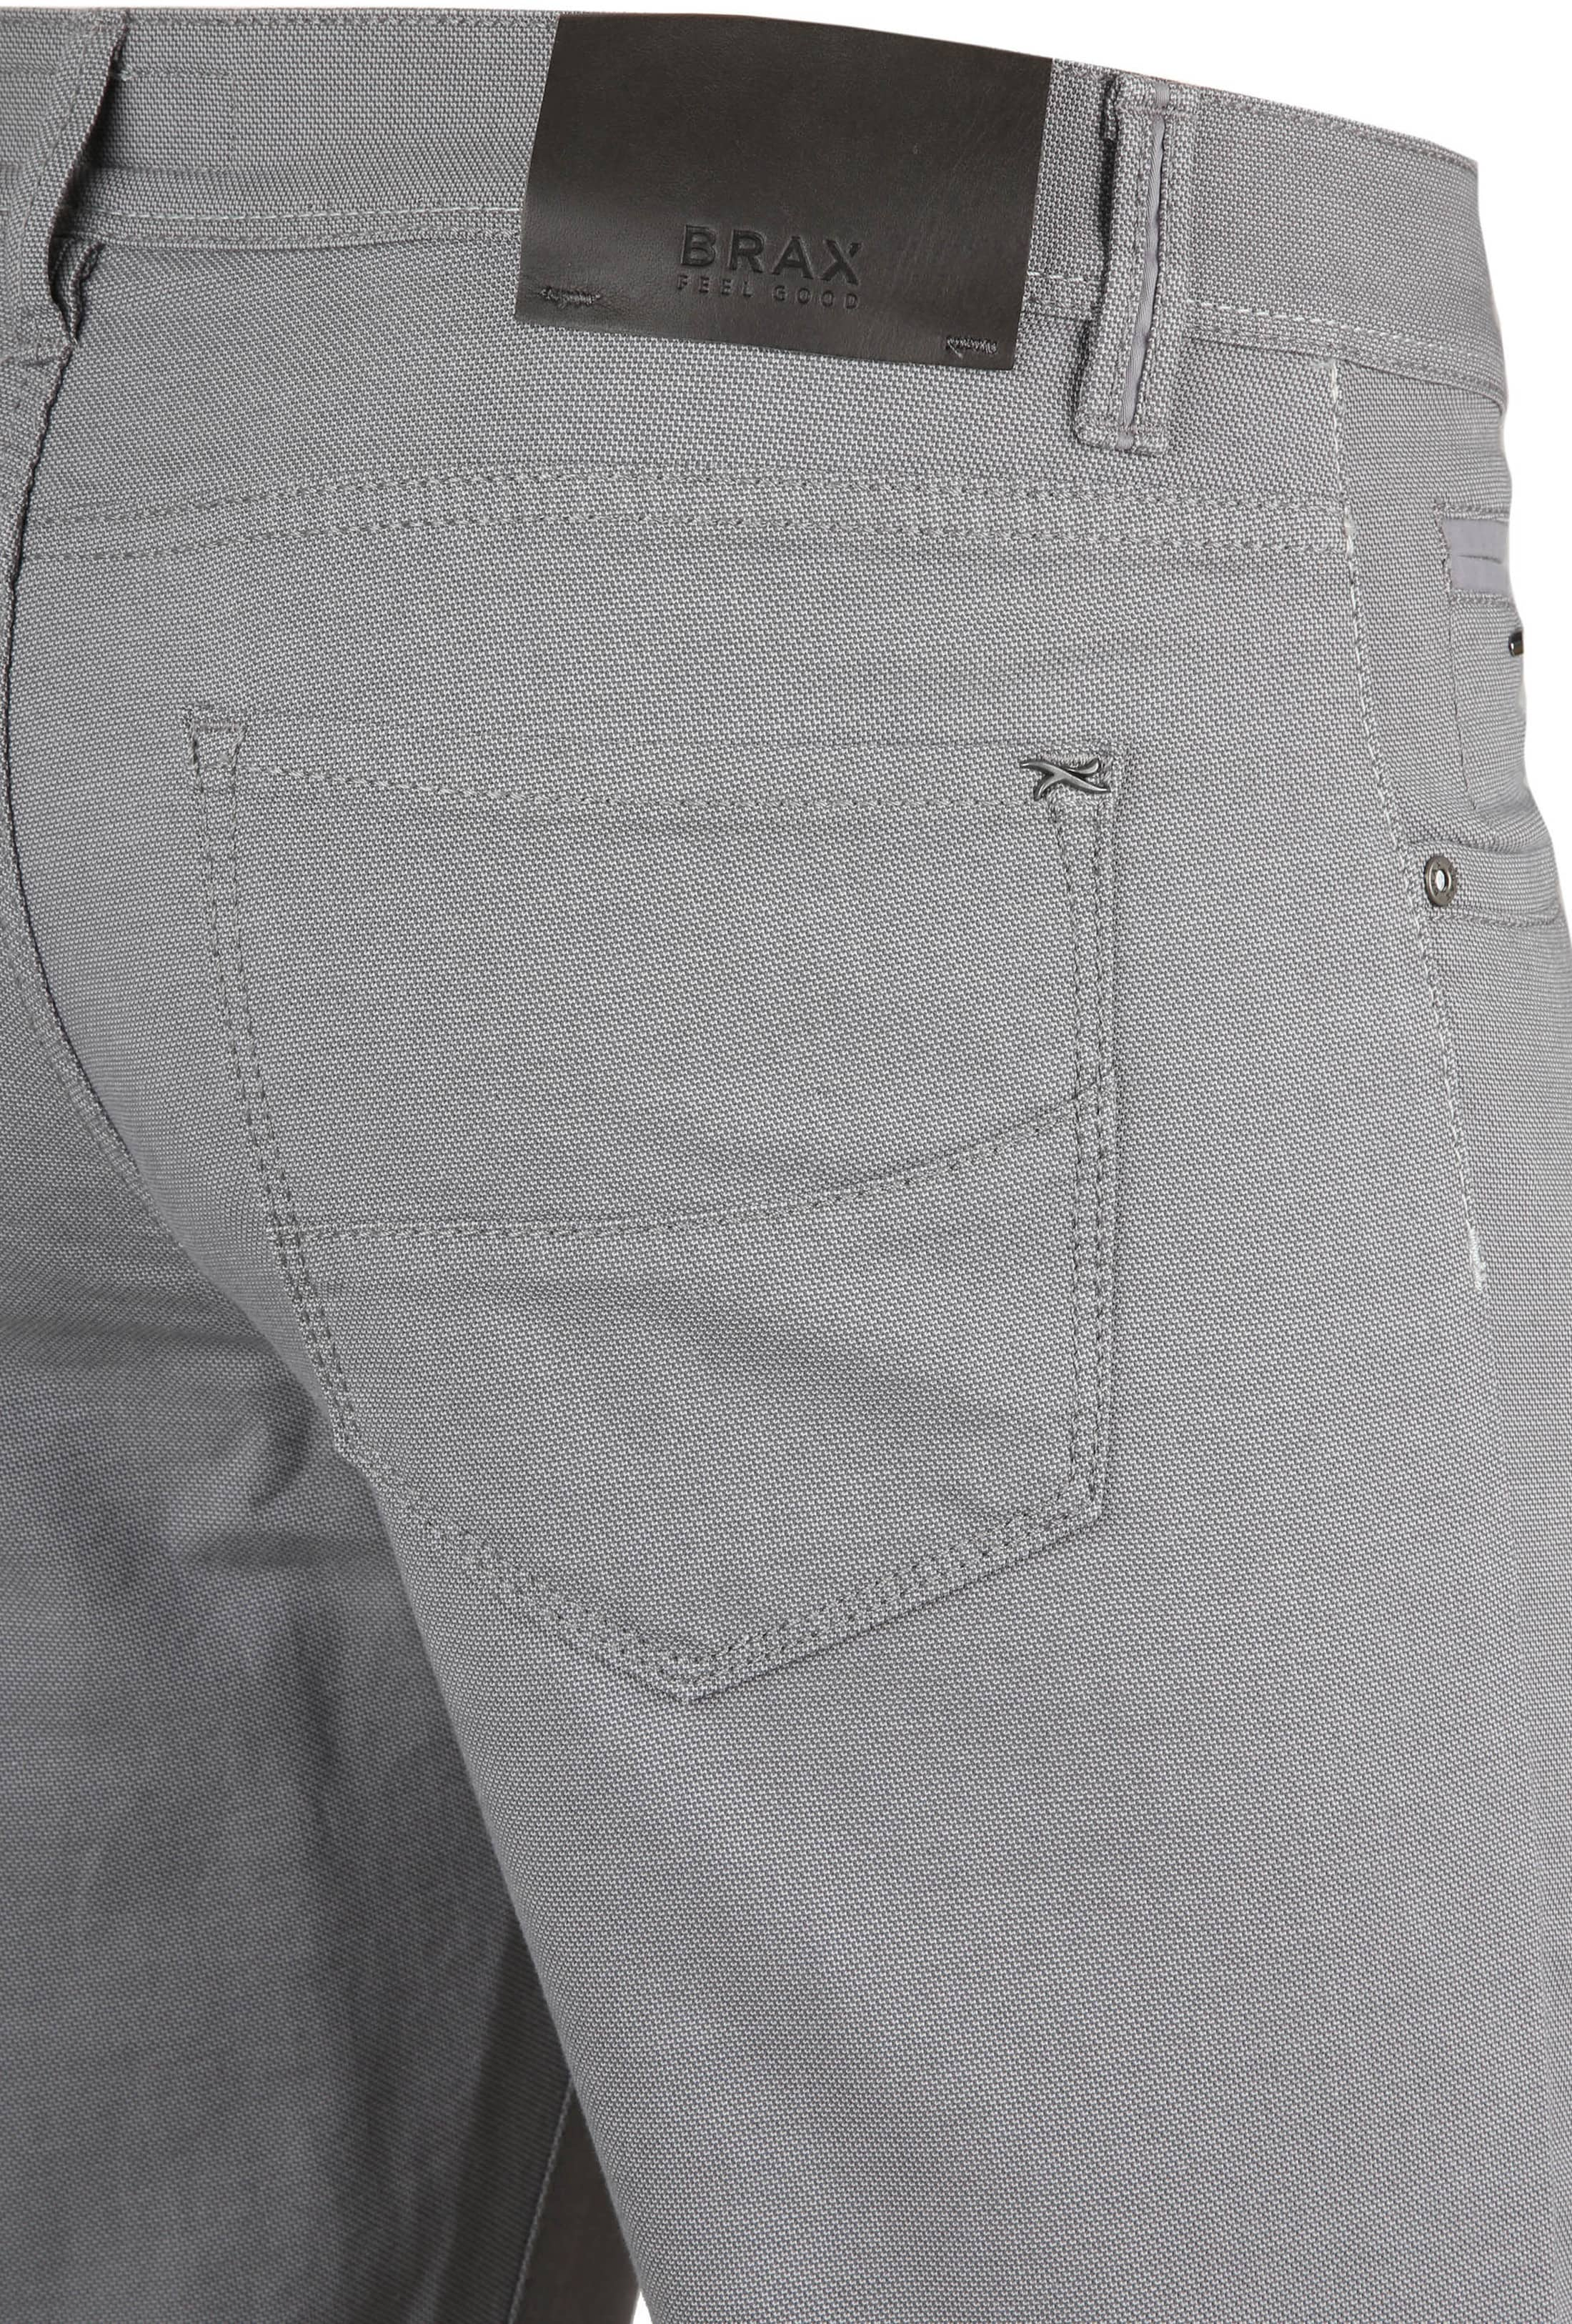 Brax Pants Grey Cadiz foto 1